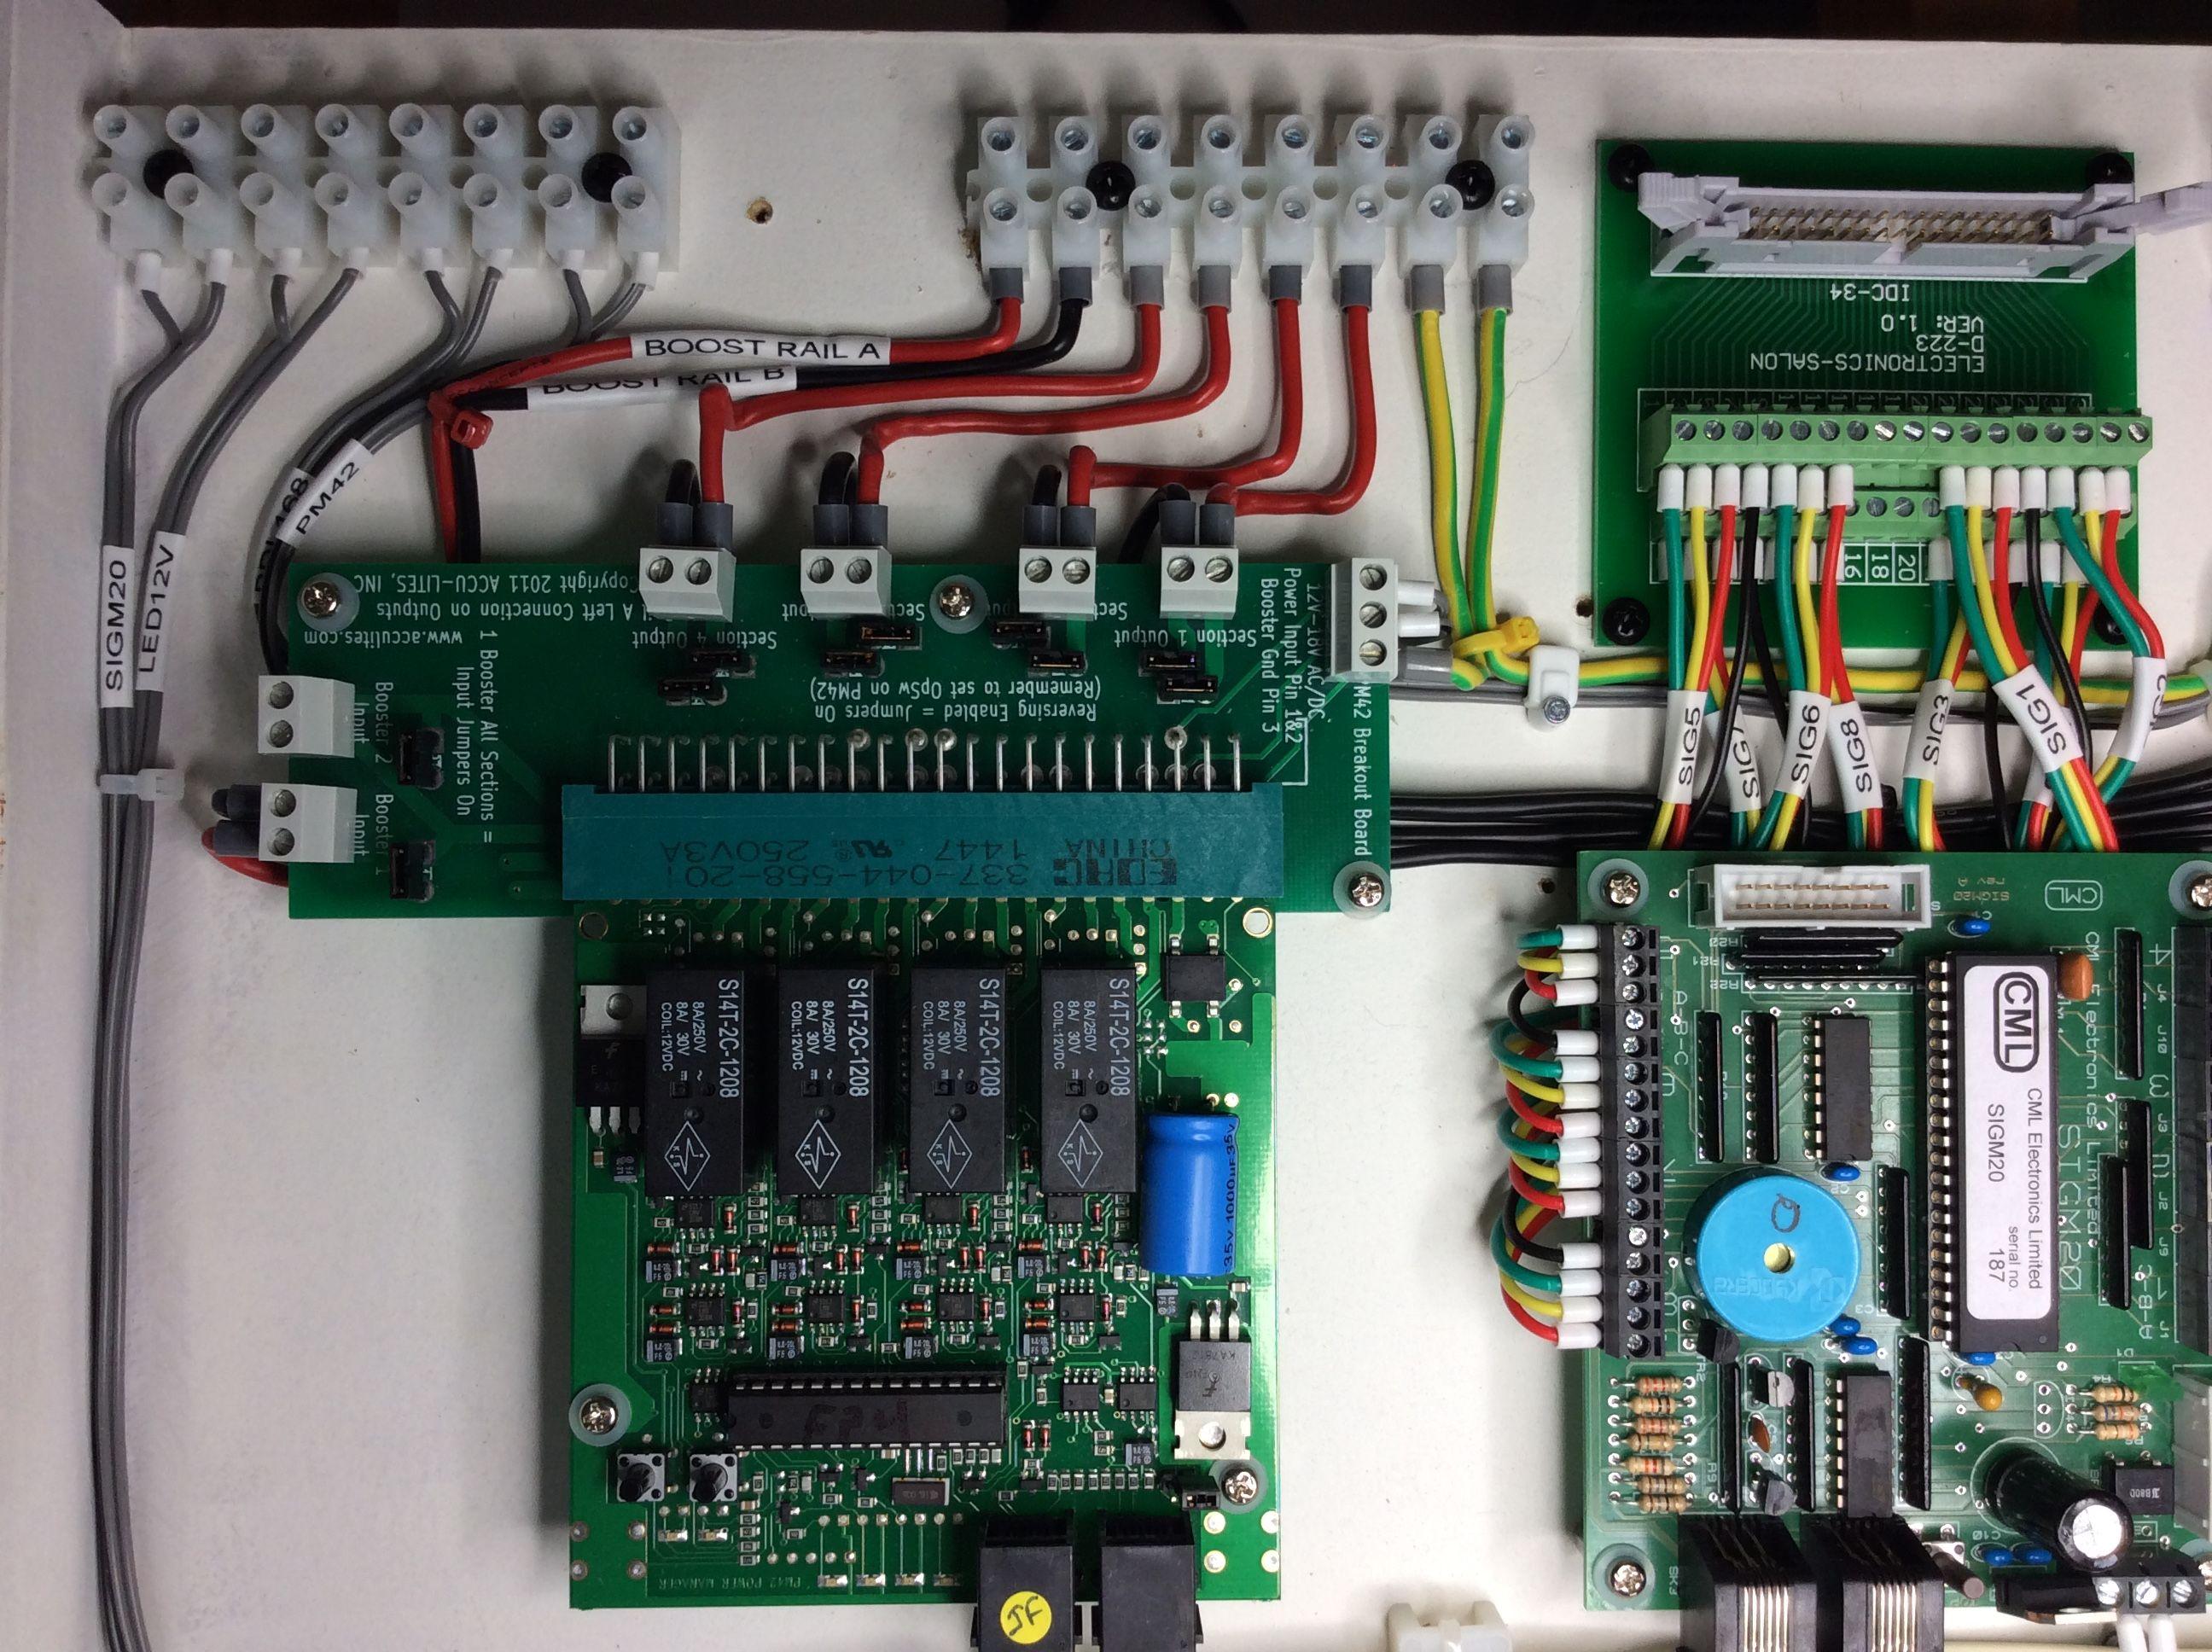 medium resolution of digitrax pm42 power manager board